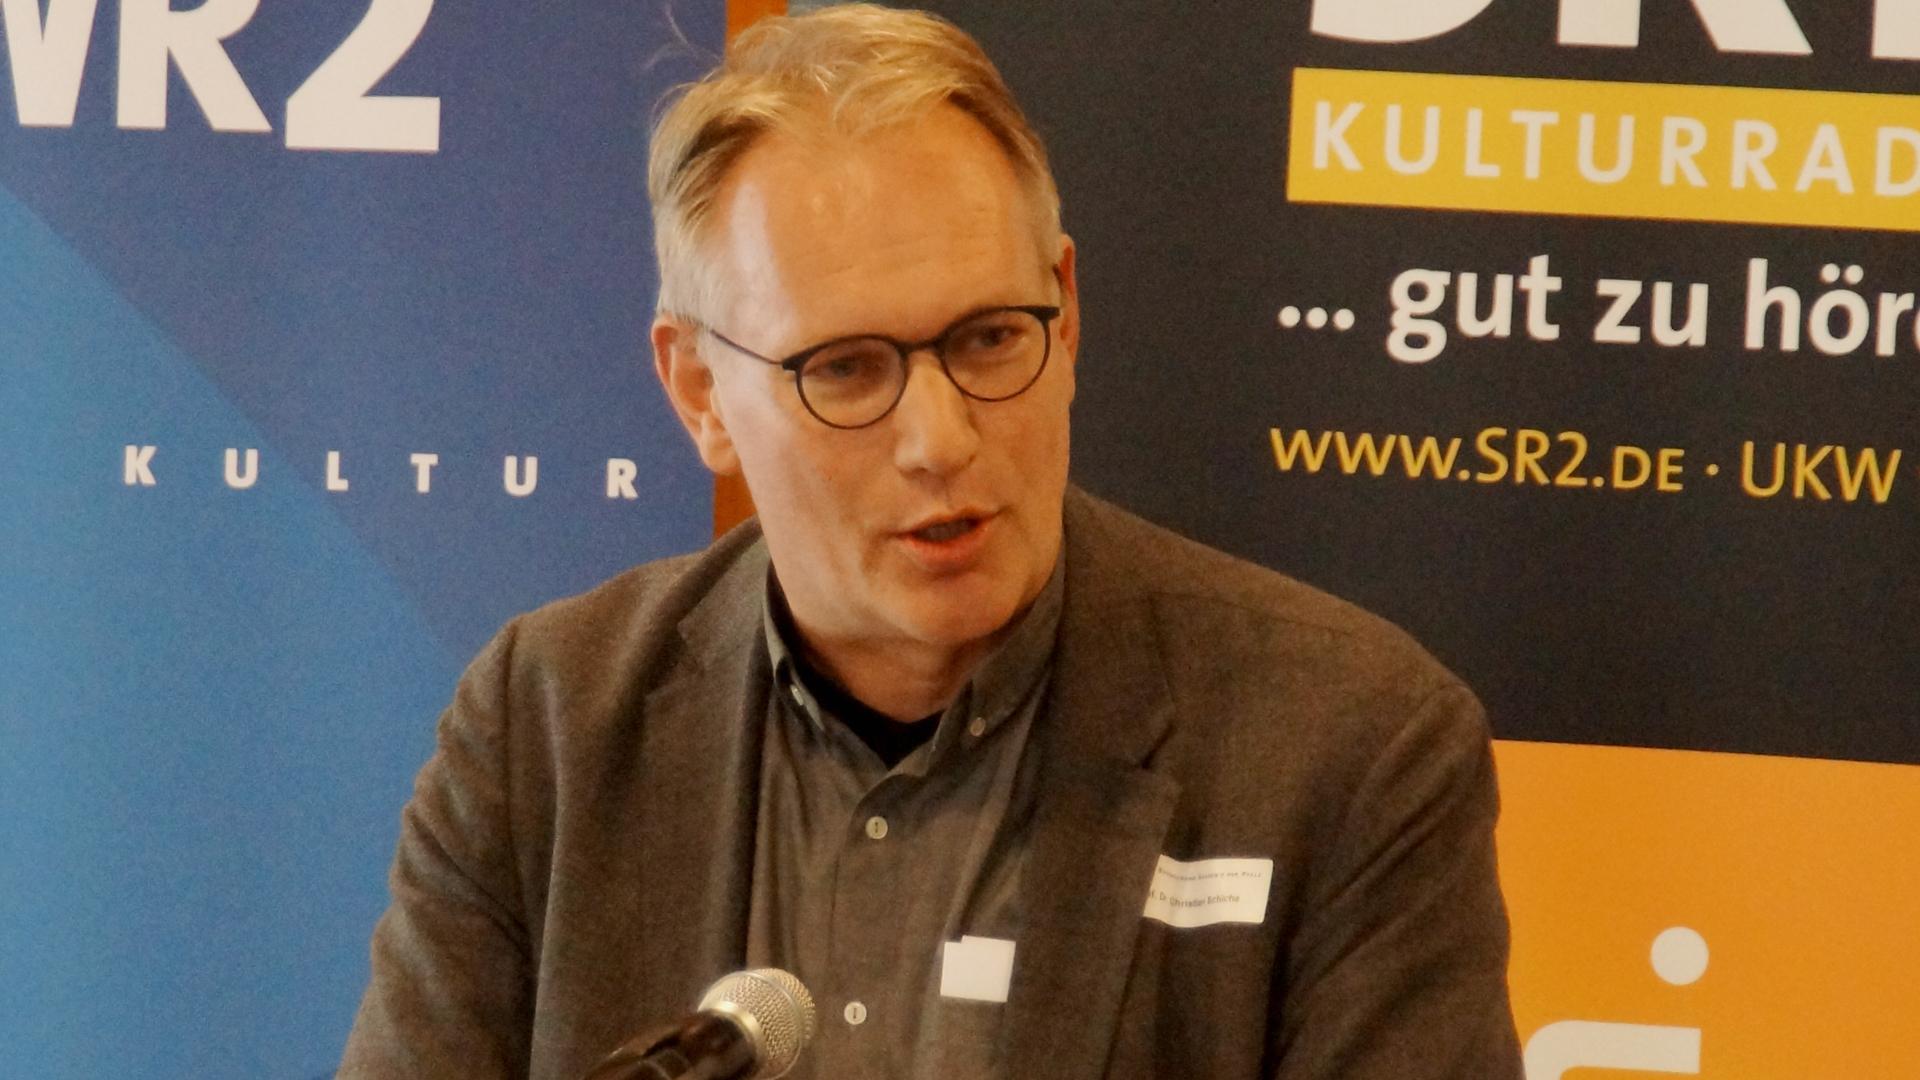 Medienethiker Christian Schicha